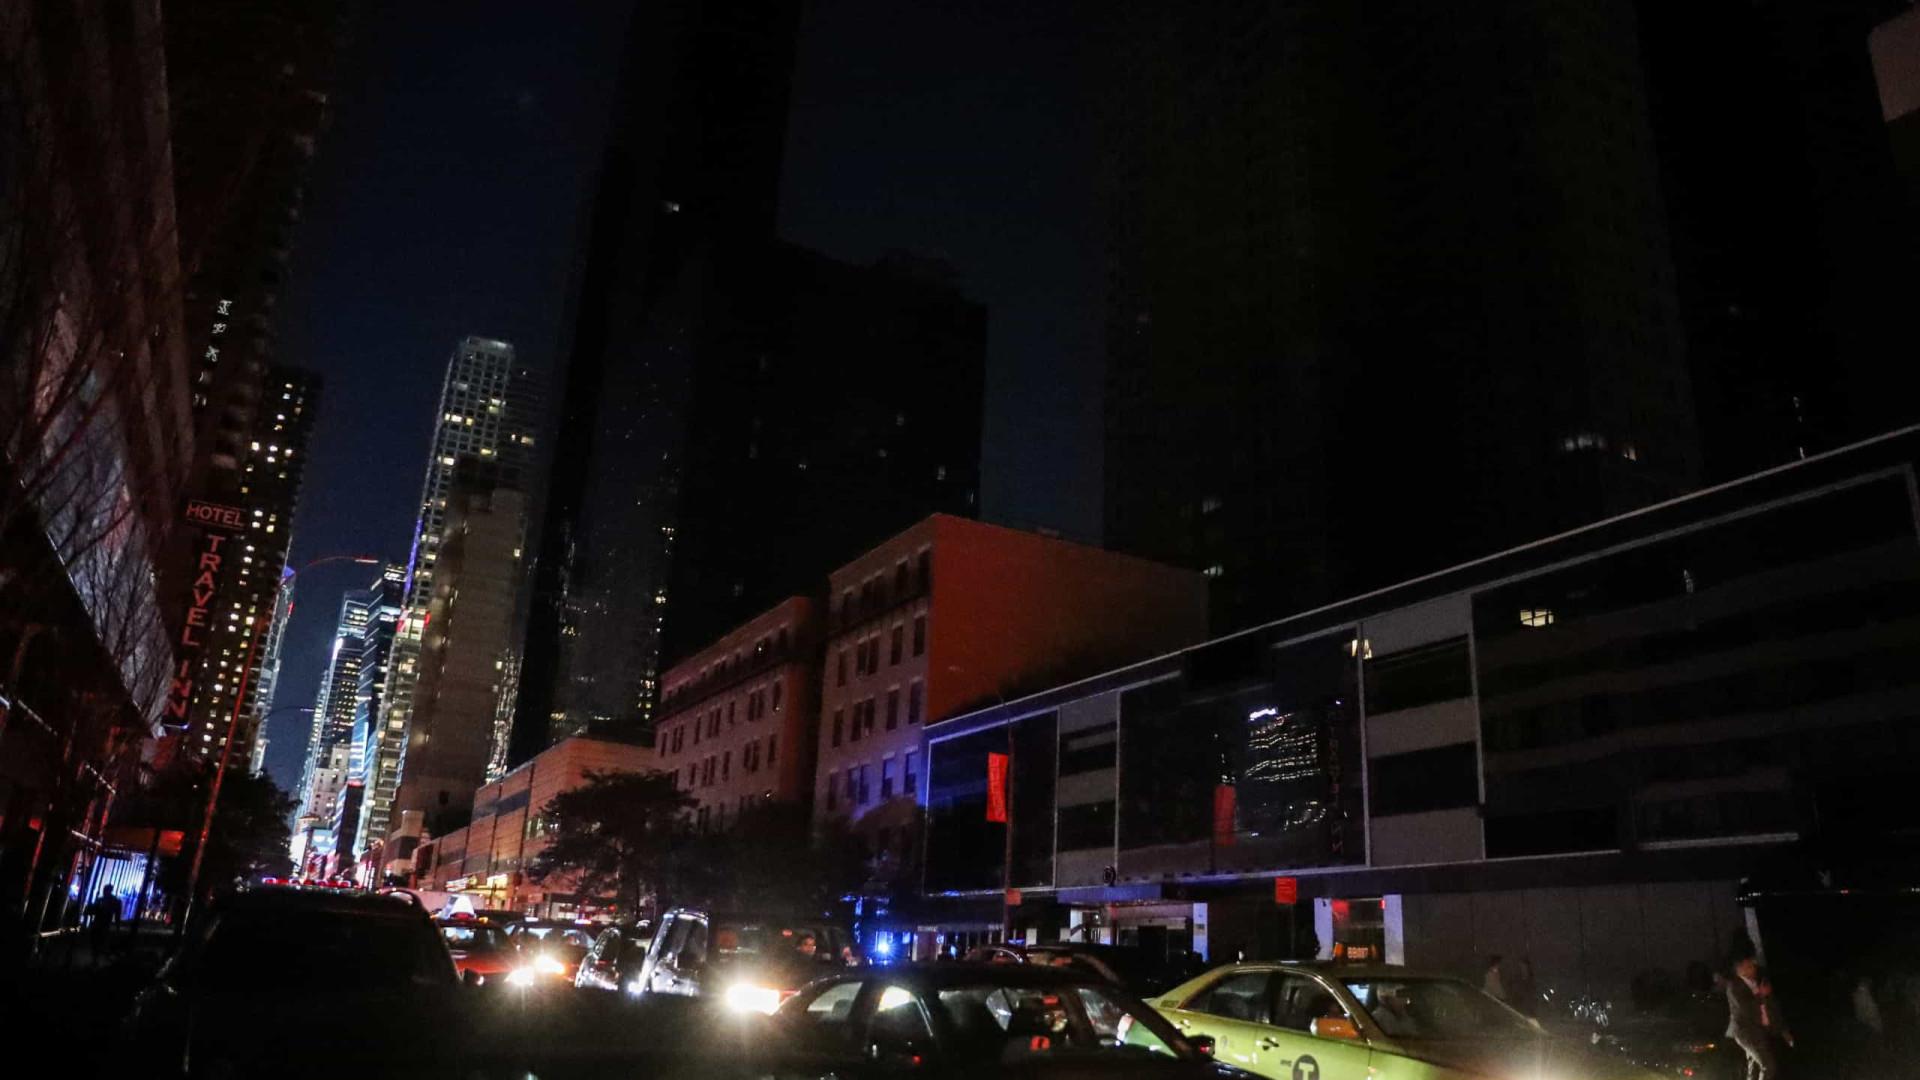 Falha de energia deixa parte de Nova Iorque às escuras